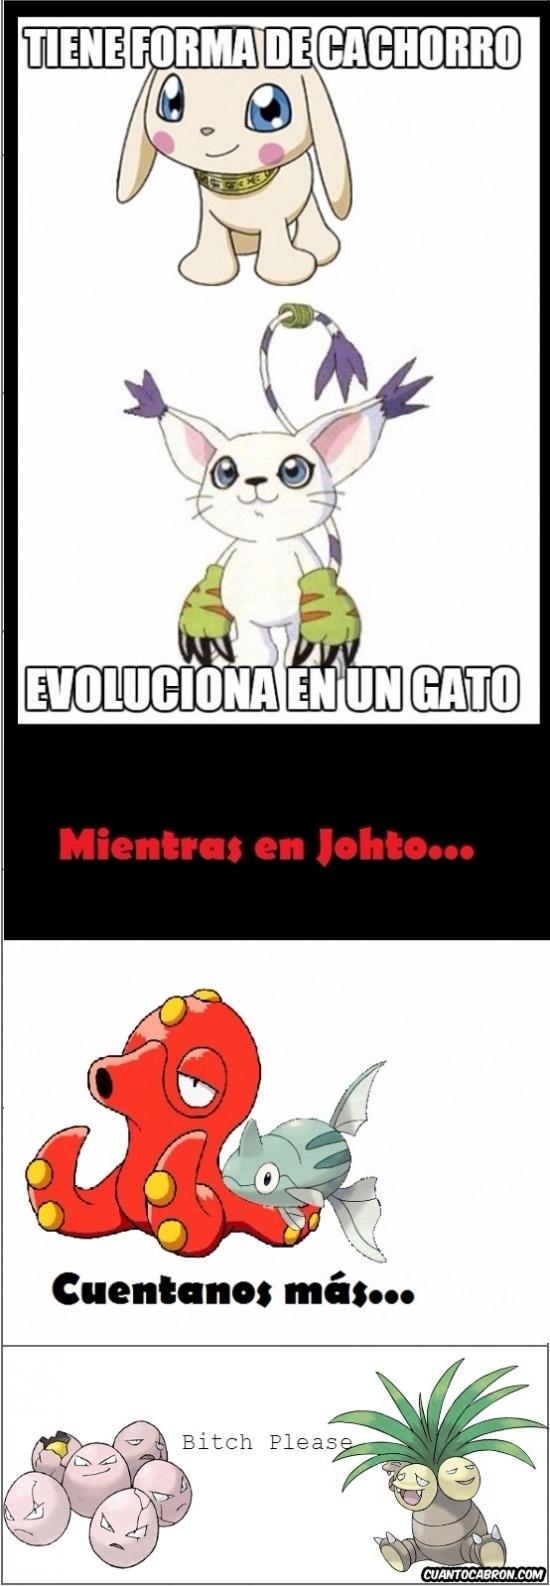 Otros - Evoluciones de Pokémon muy raras